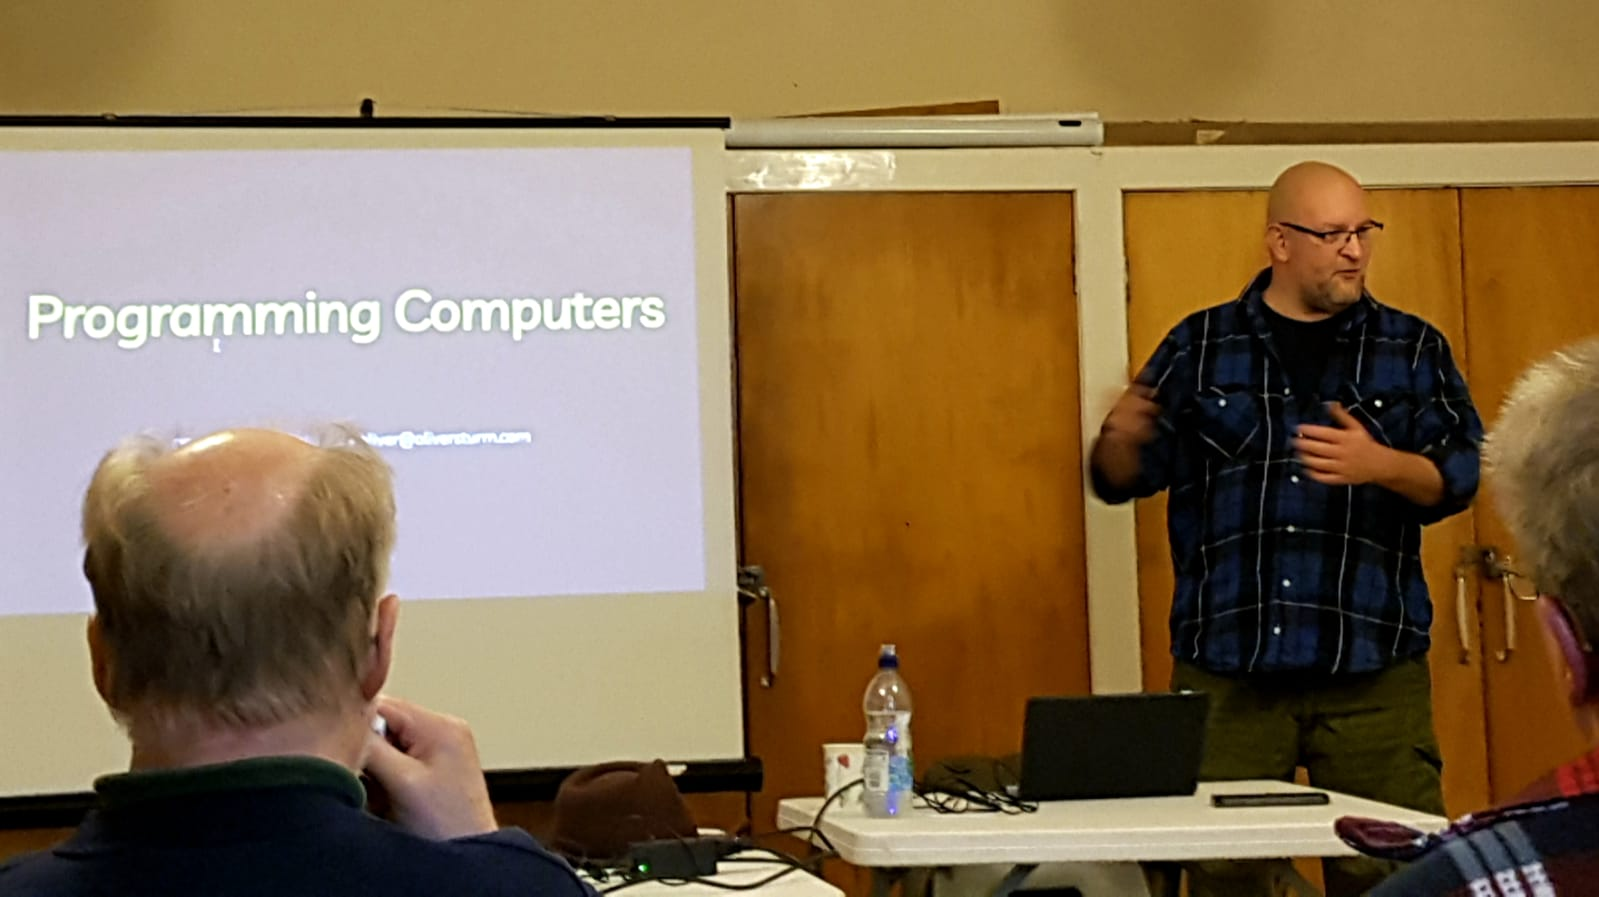 Programming Computers